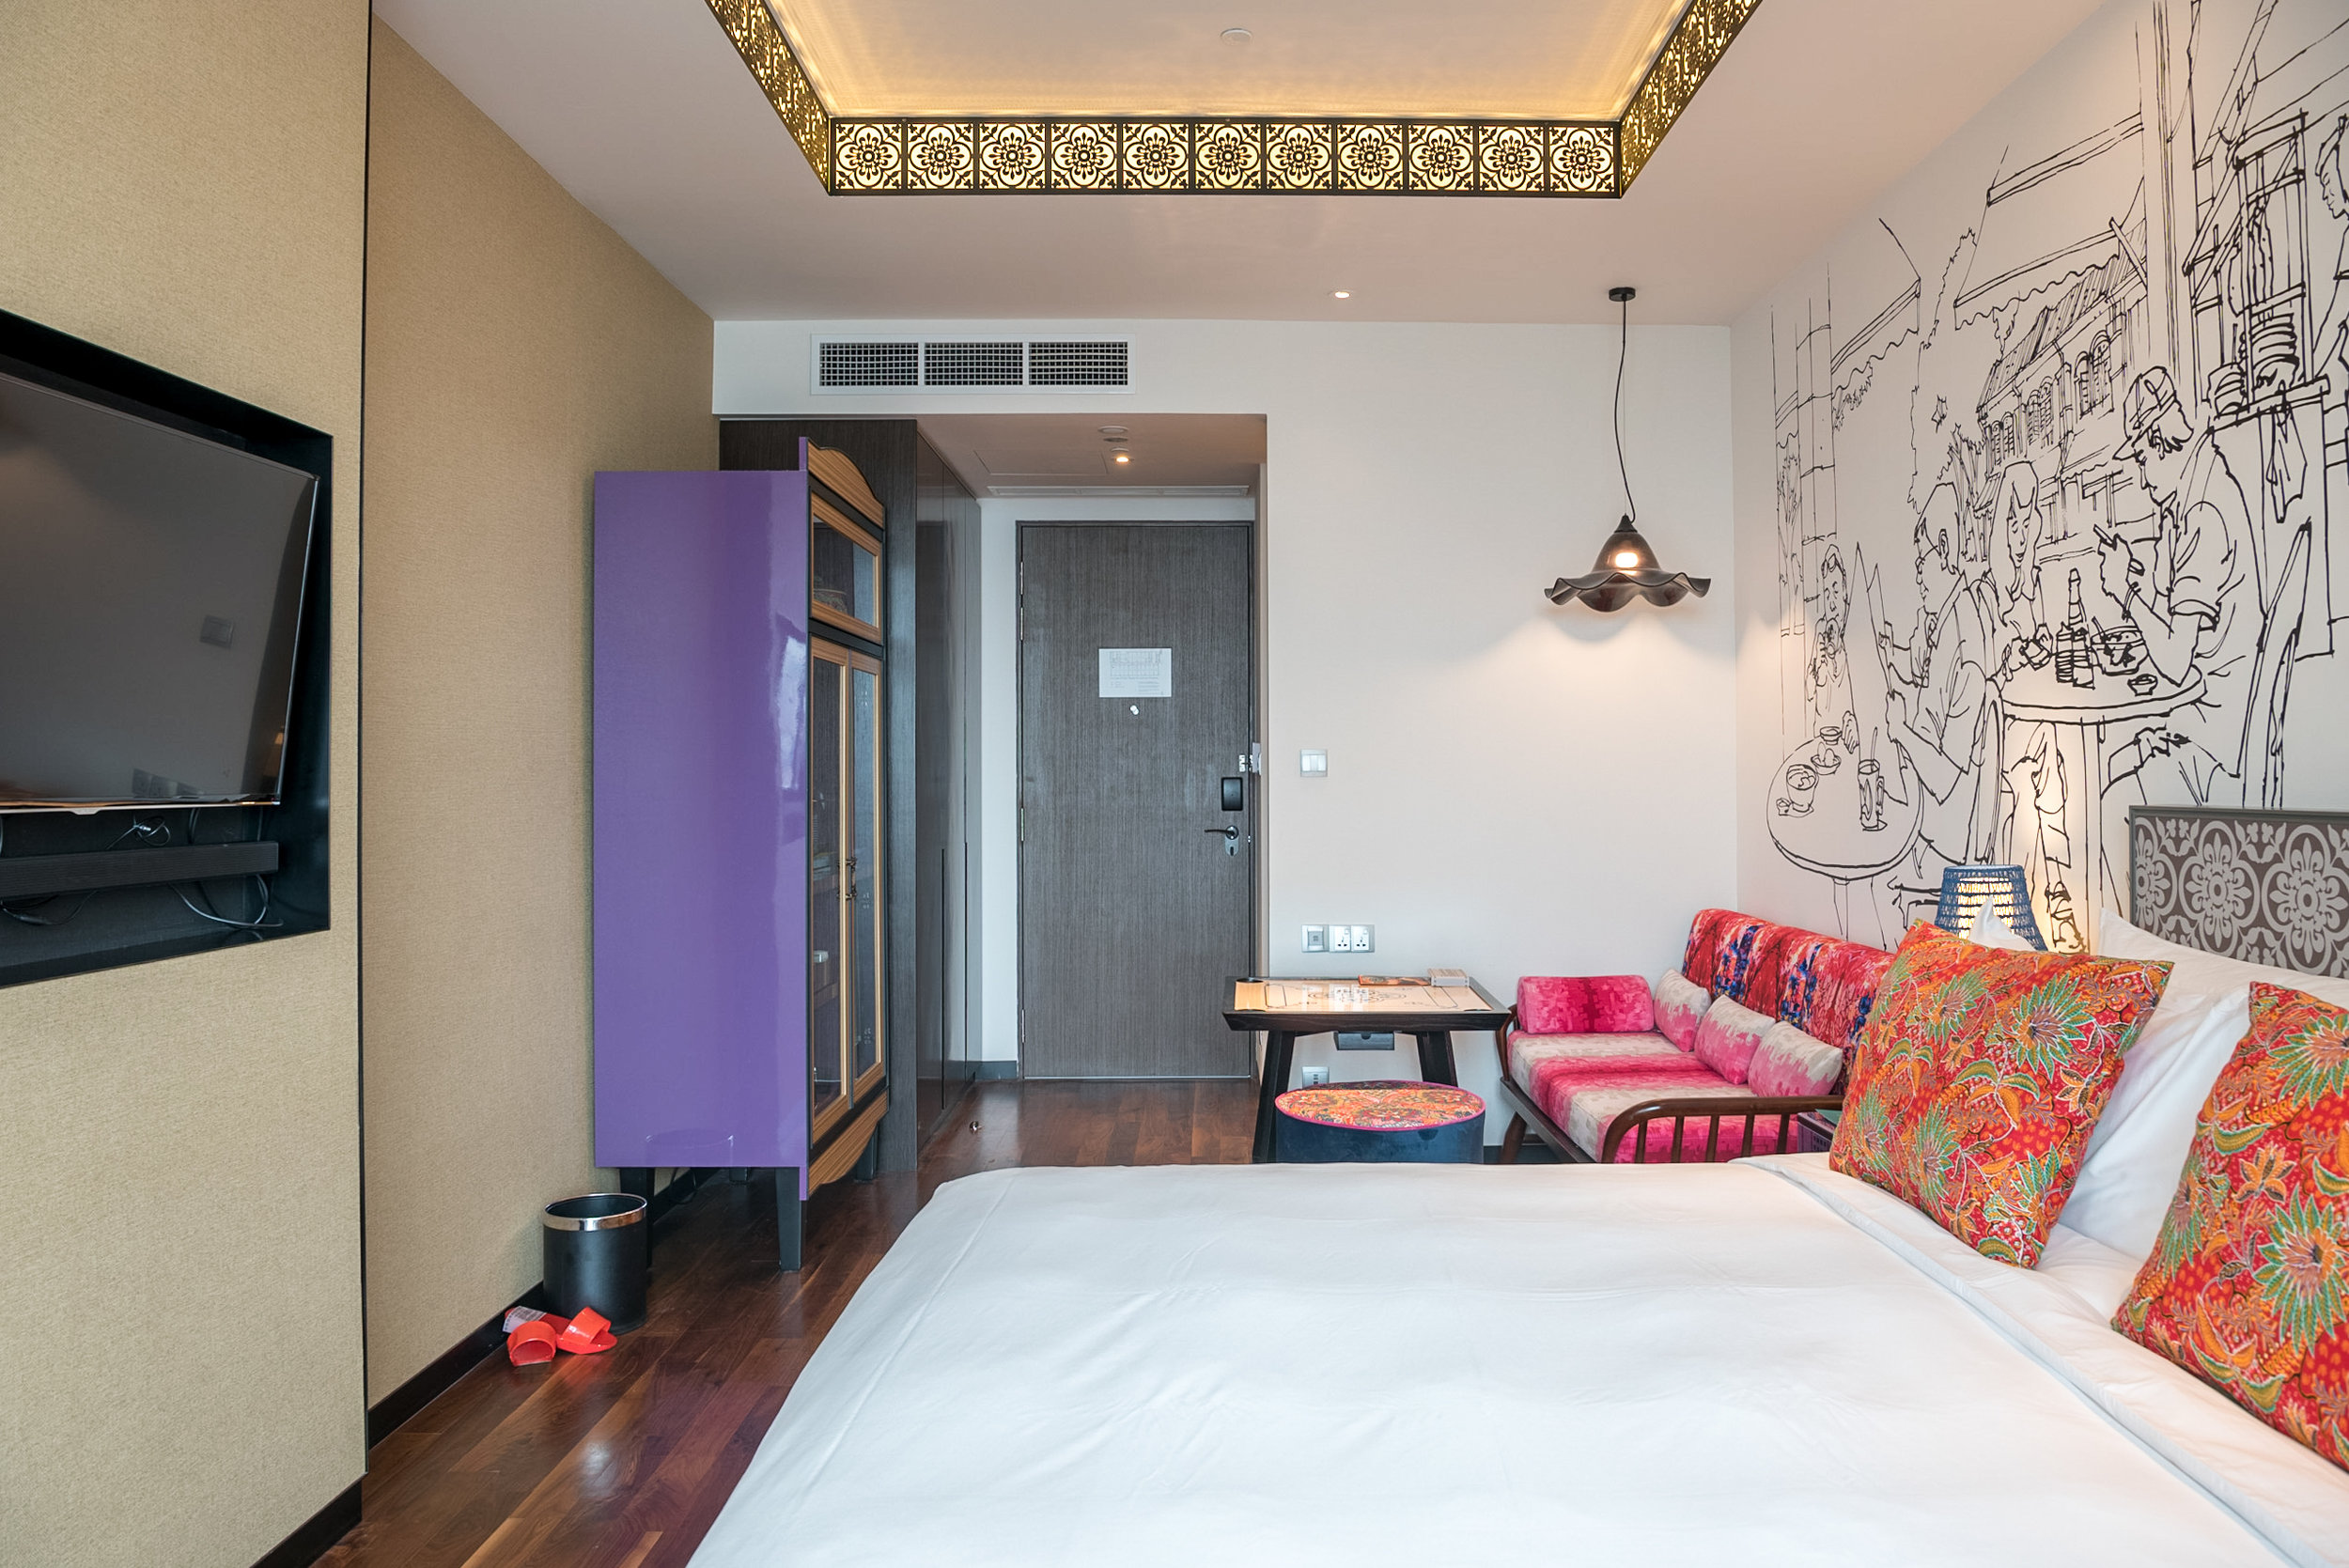 Bedroom  Premier View Room with Bathtub - Hotel Indigo Singapore Katong